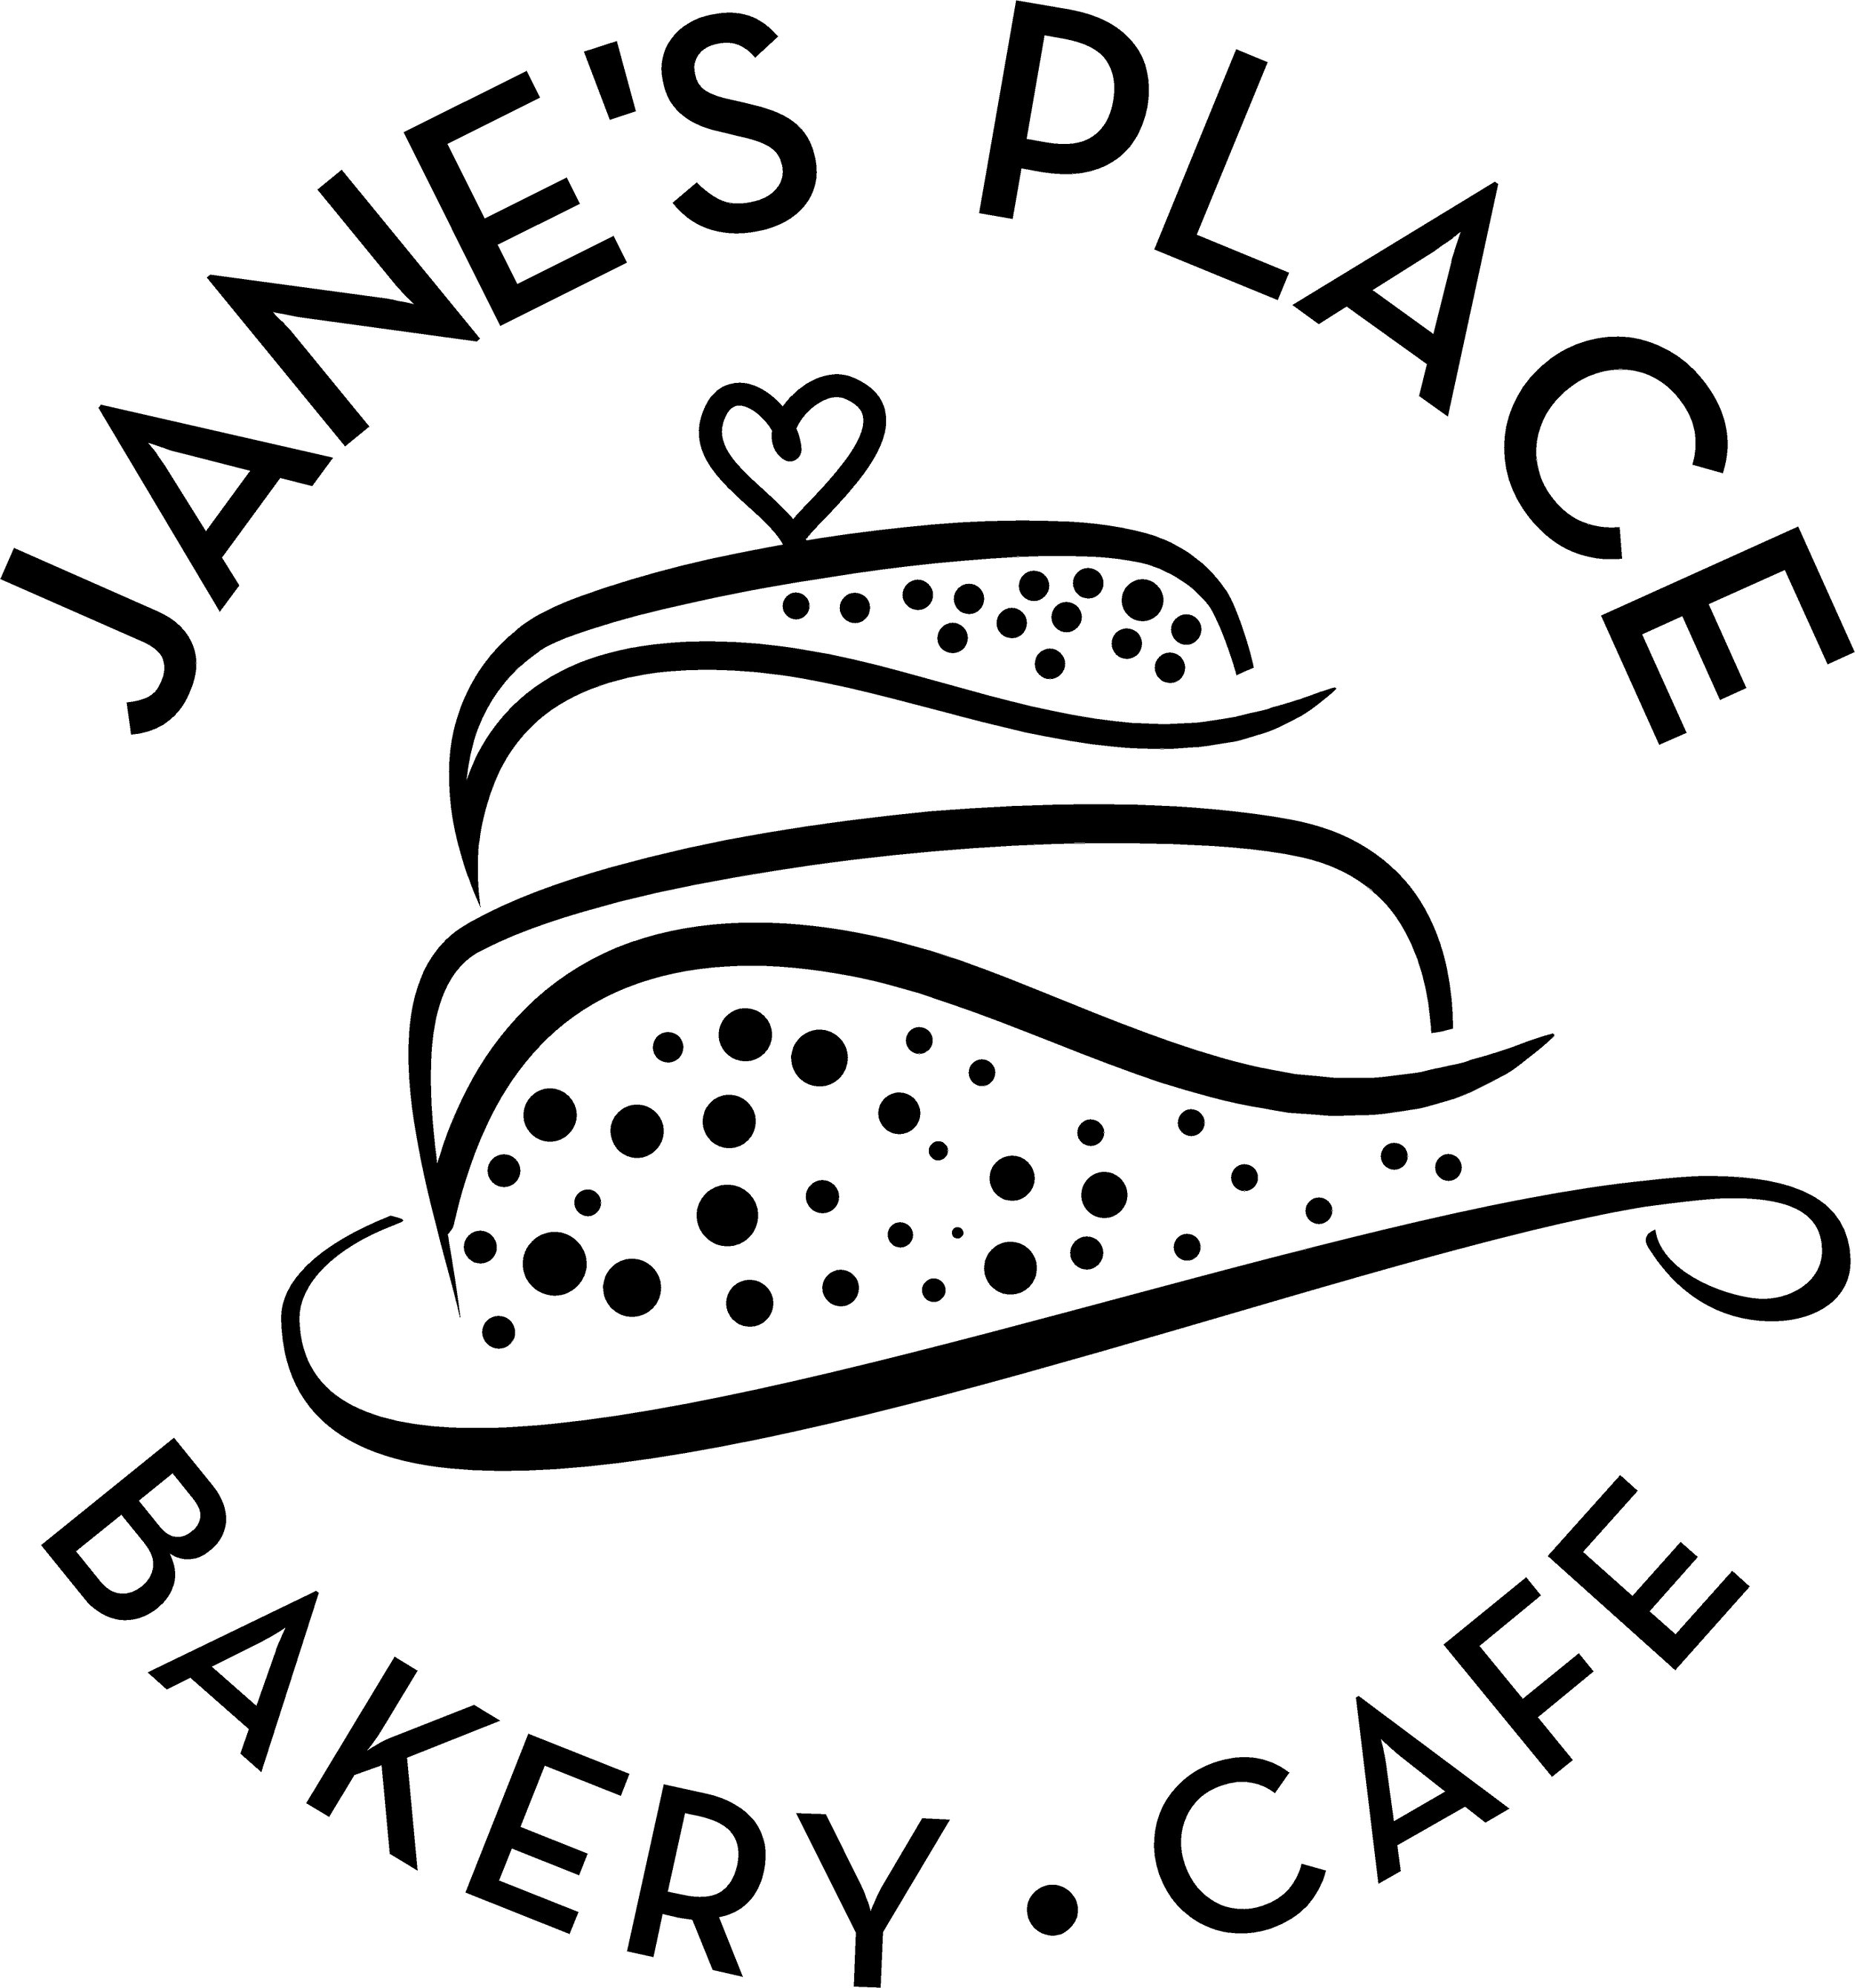 Jane's Place logo.jpg